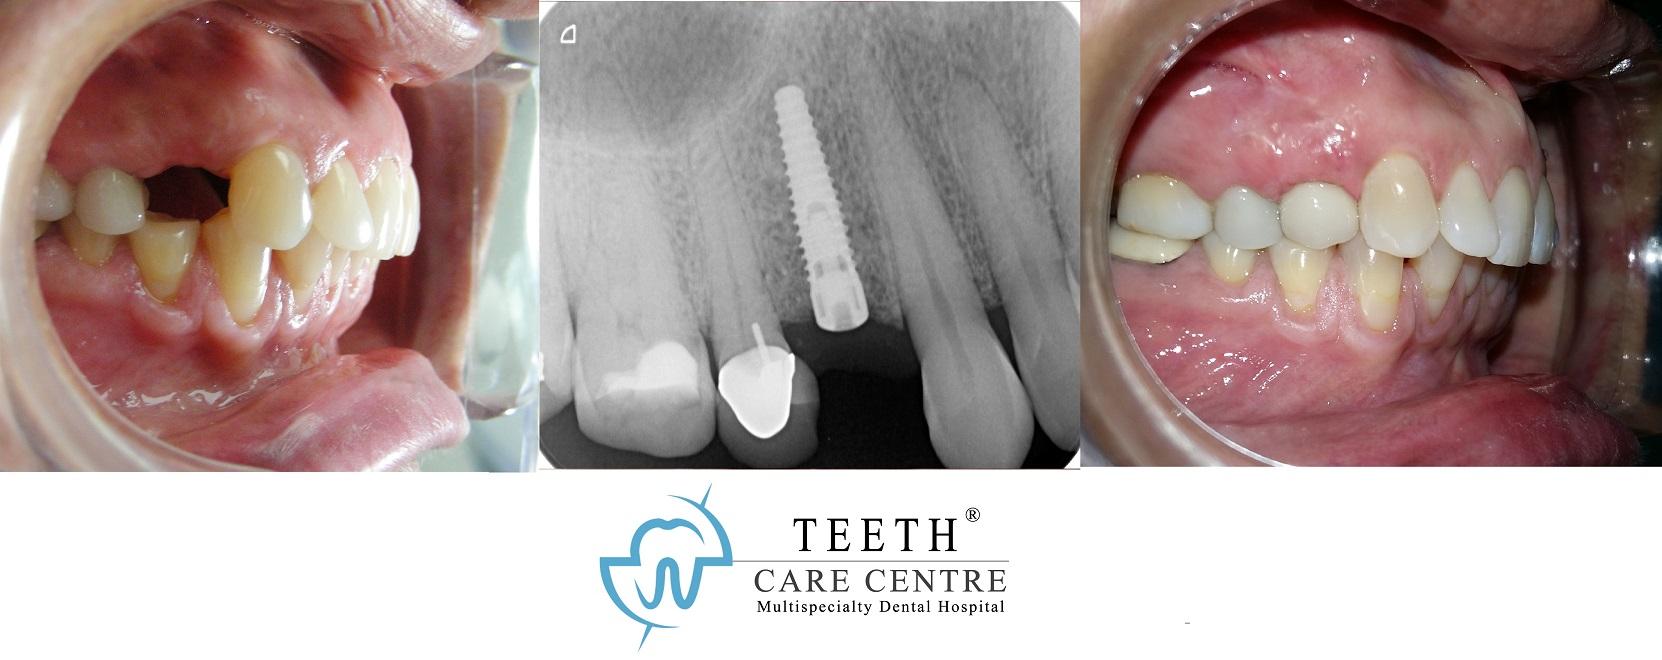 dental implant ahmedabad dentist surgeon nobel biocare